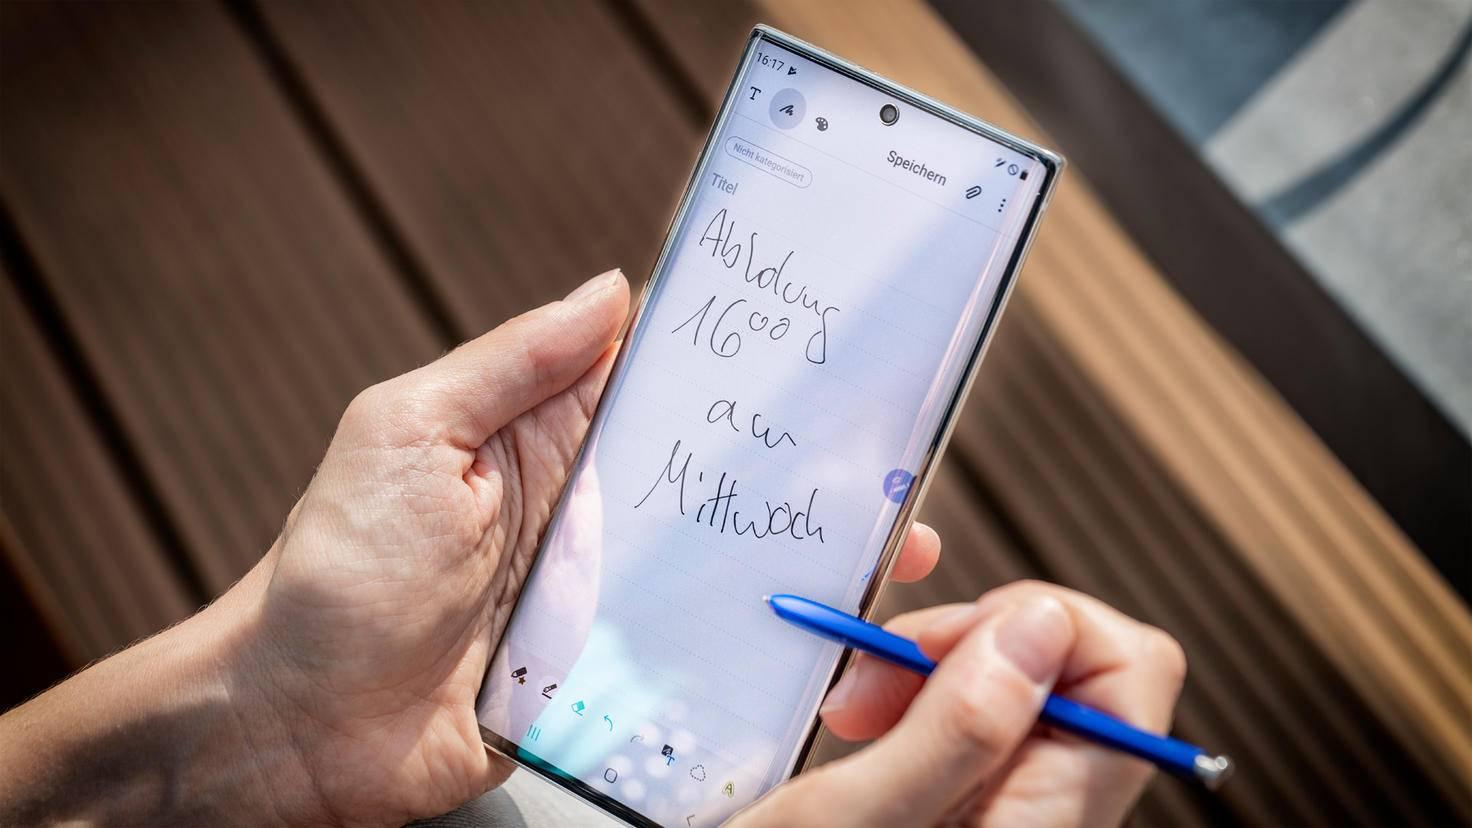 Galaxy Note 10 Plus S Pen